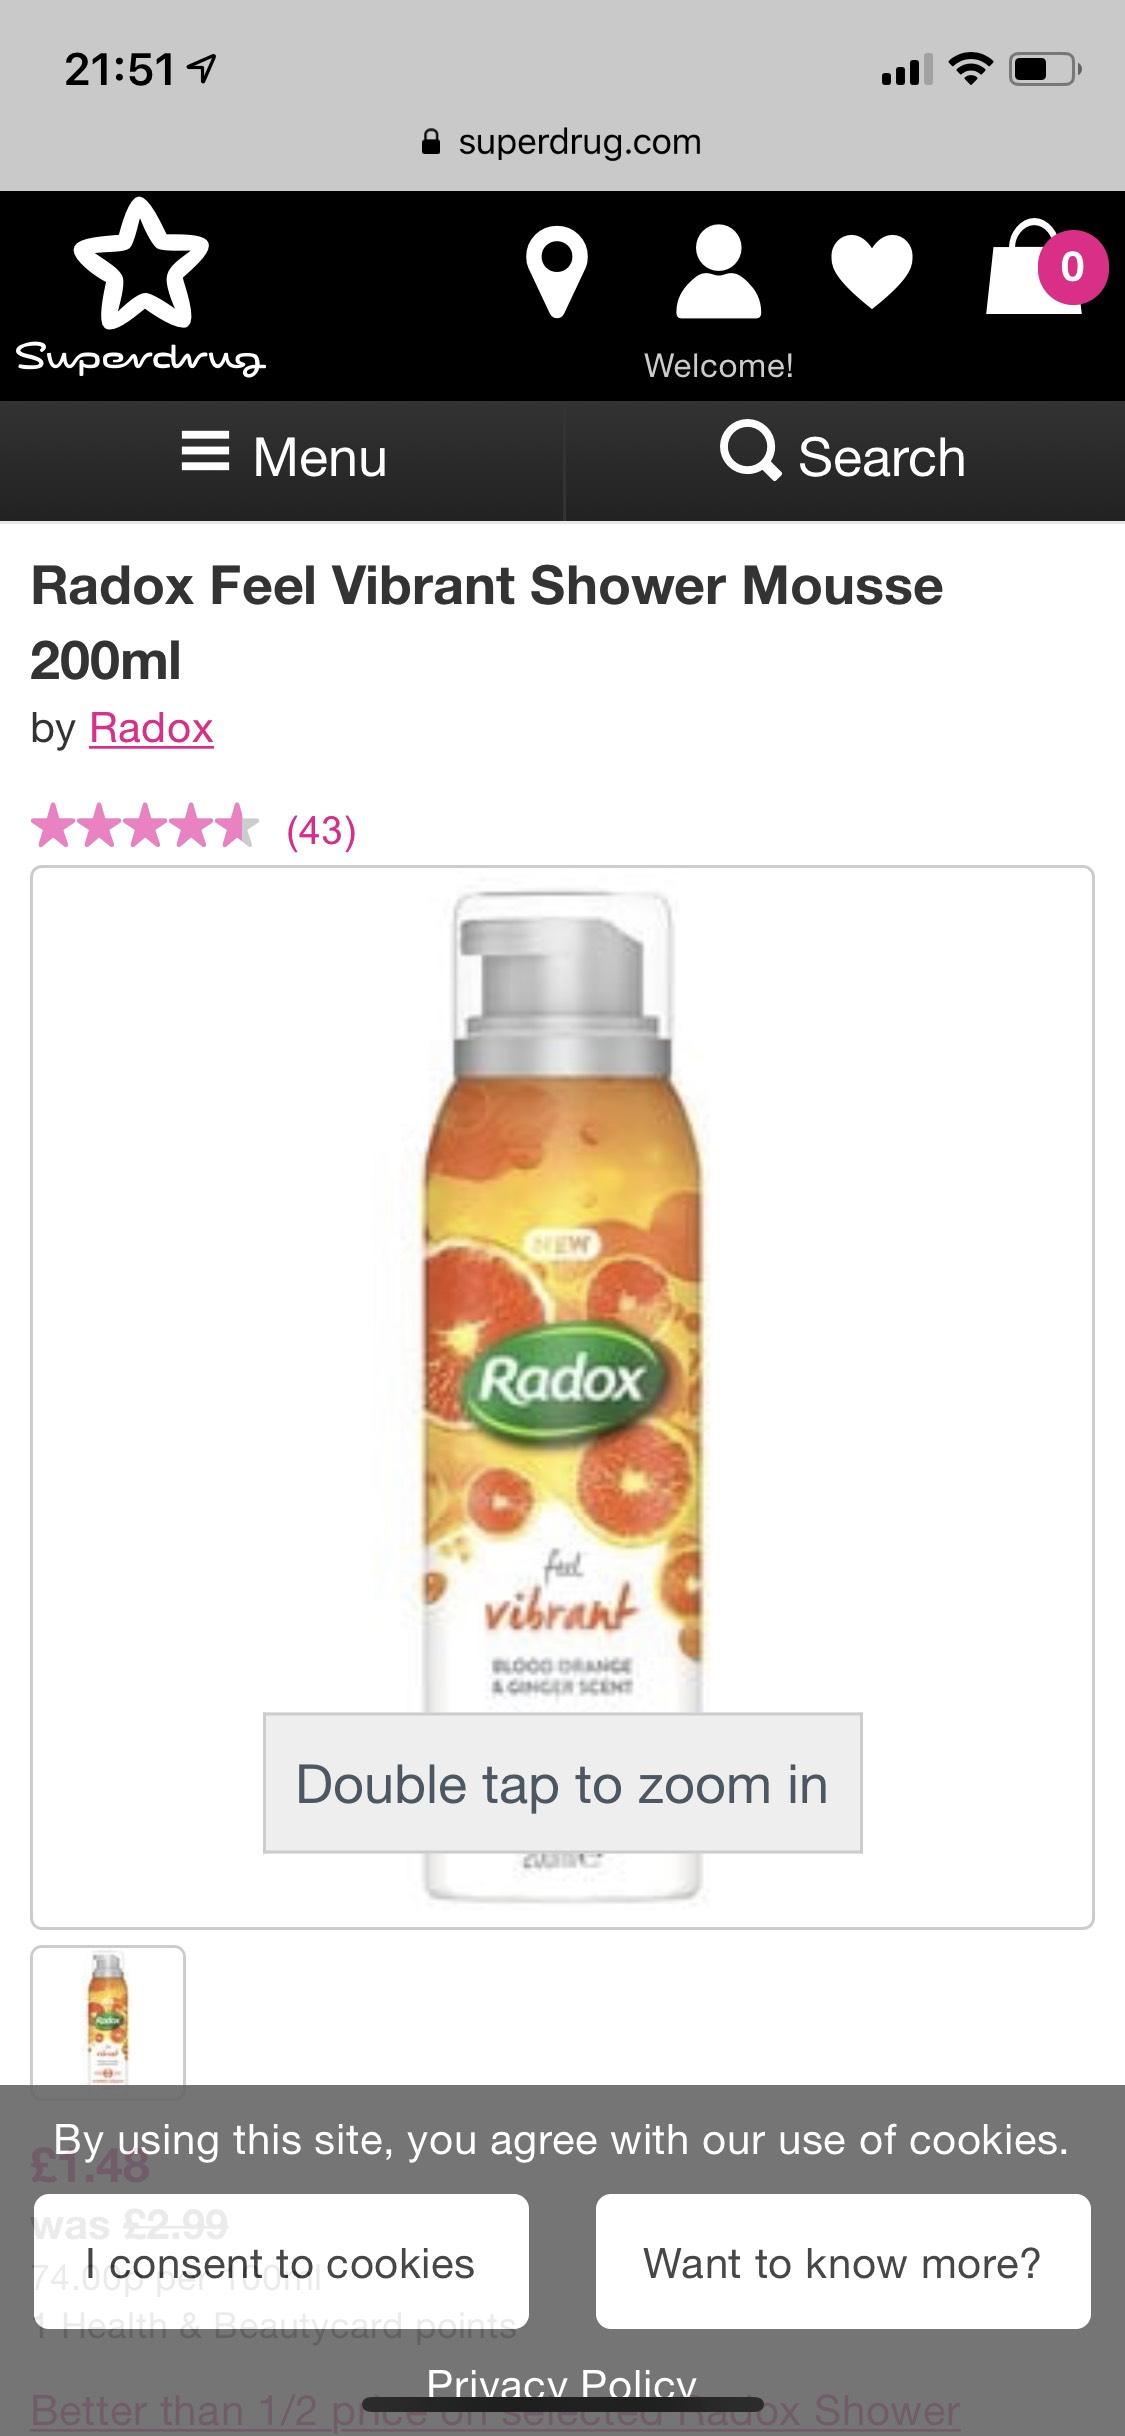 Radox Feel Vibrant Shower Mousse 200ml - £1.48 was £2.99 @ Superdrug (free C&C)